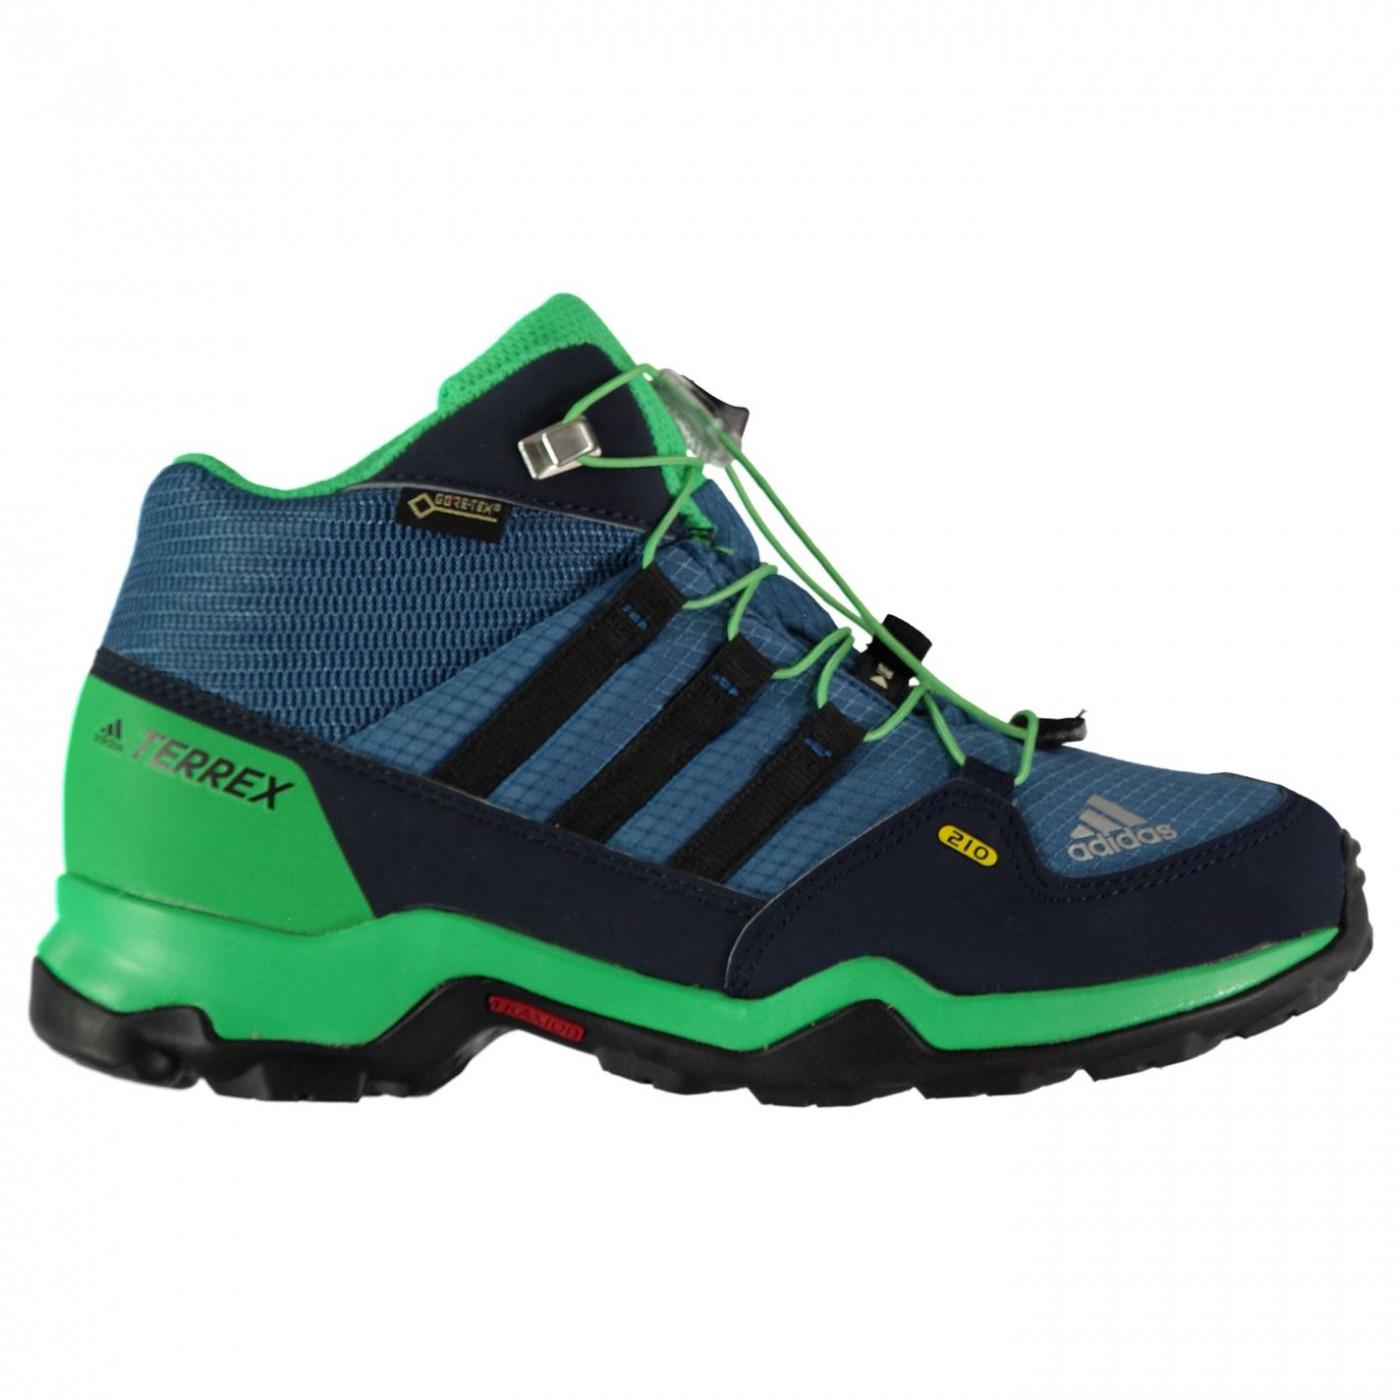 Adidas Terrex GTX Mid Top Junior Walking Boots